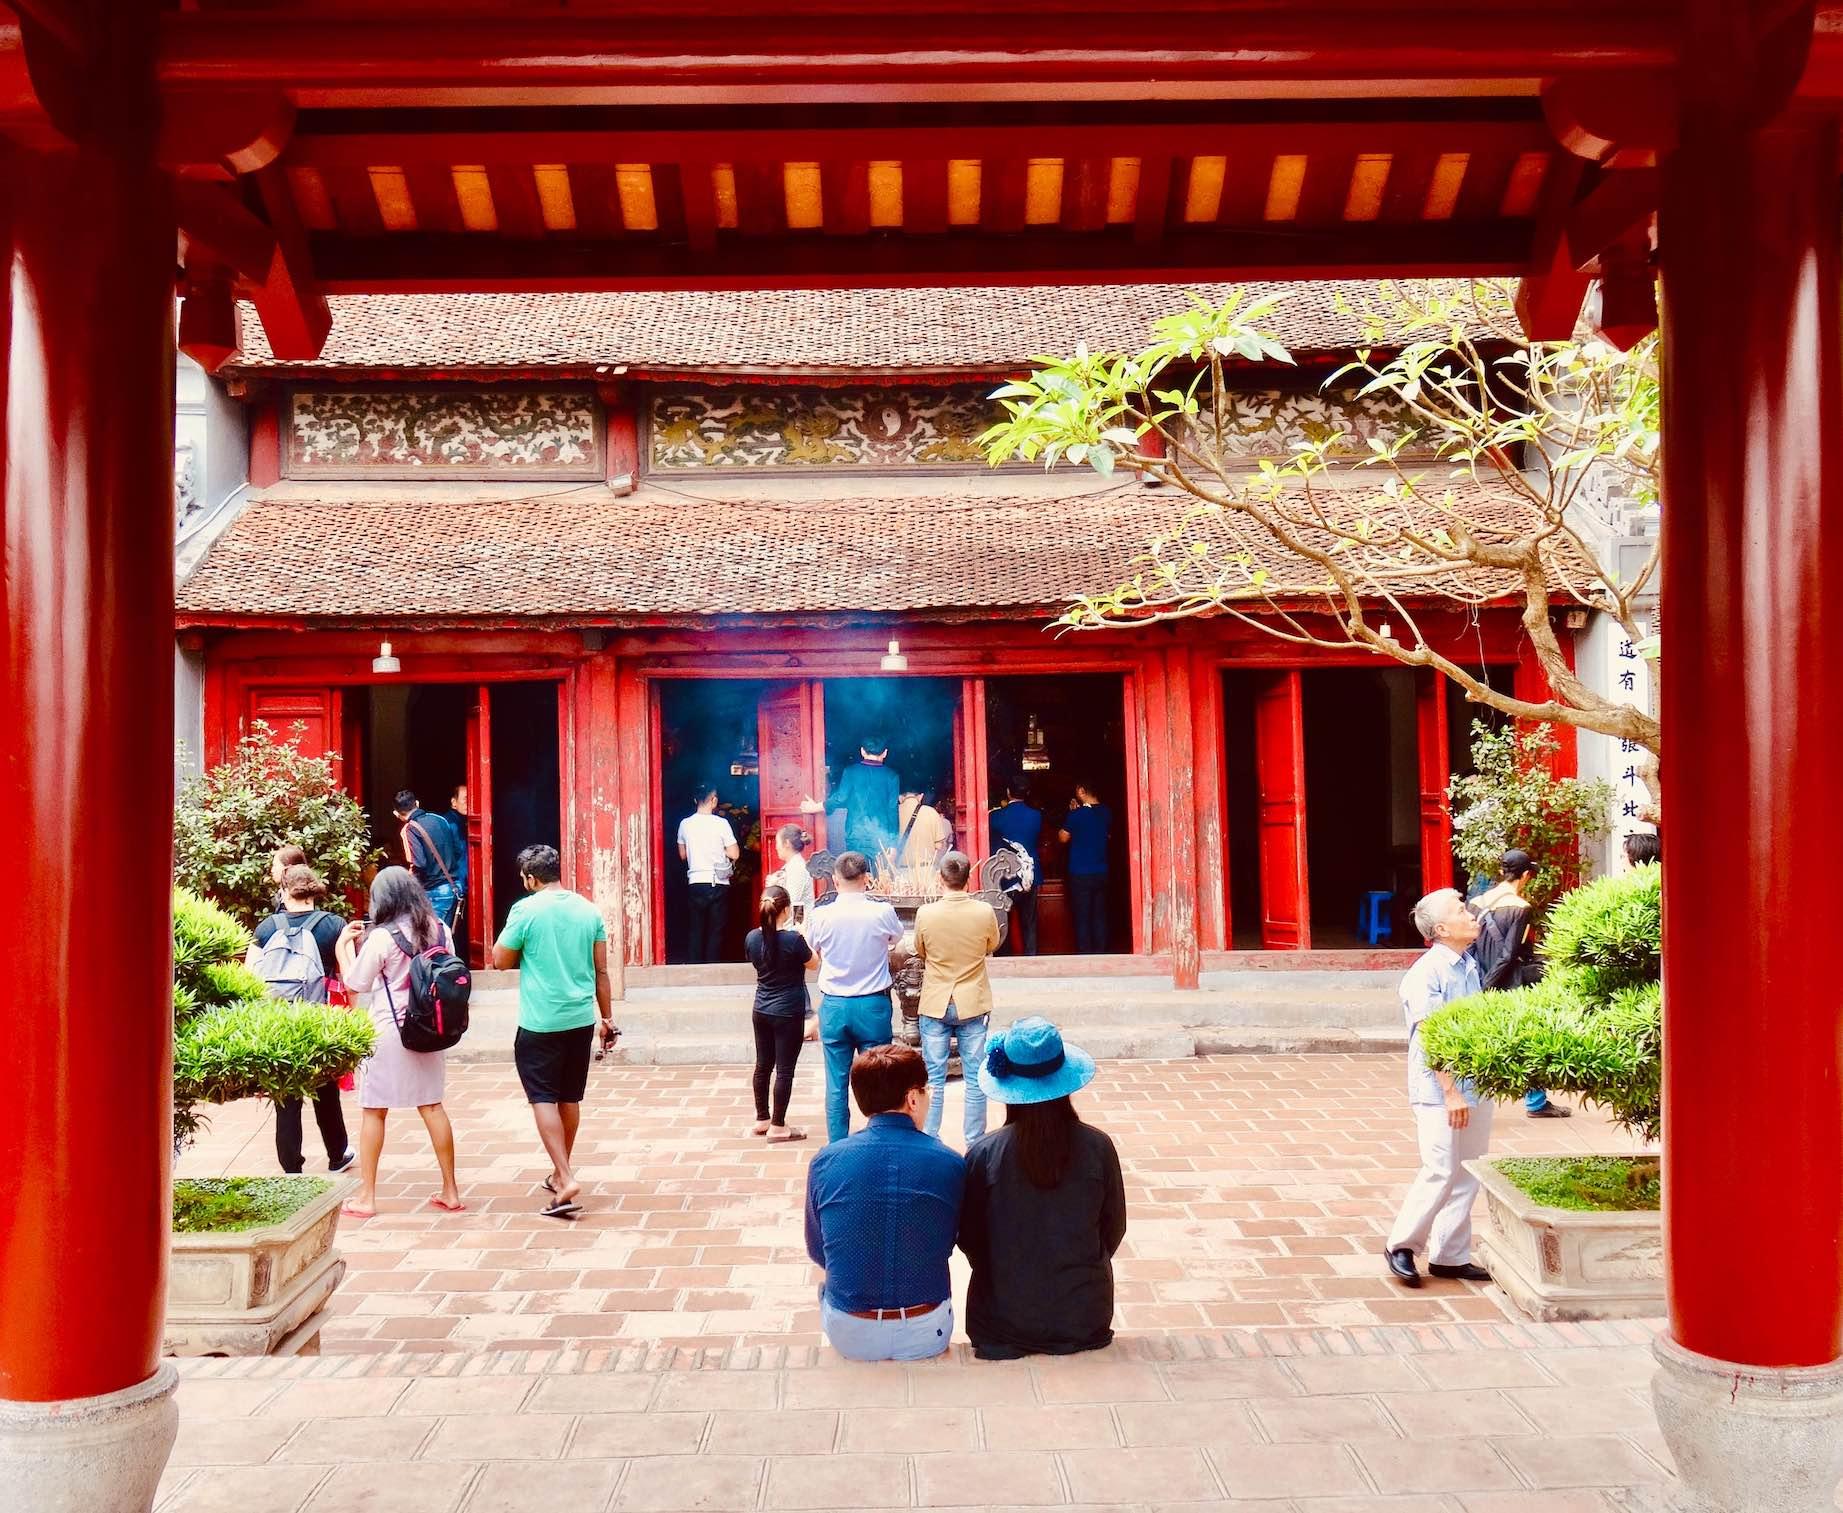 Visit Ngoc Son Temple in Hanoi.